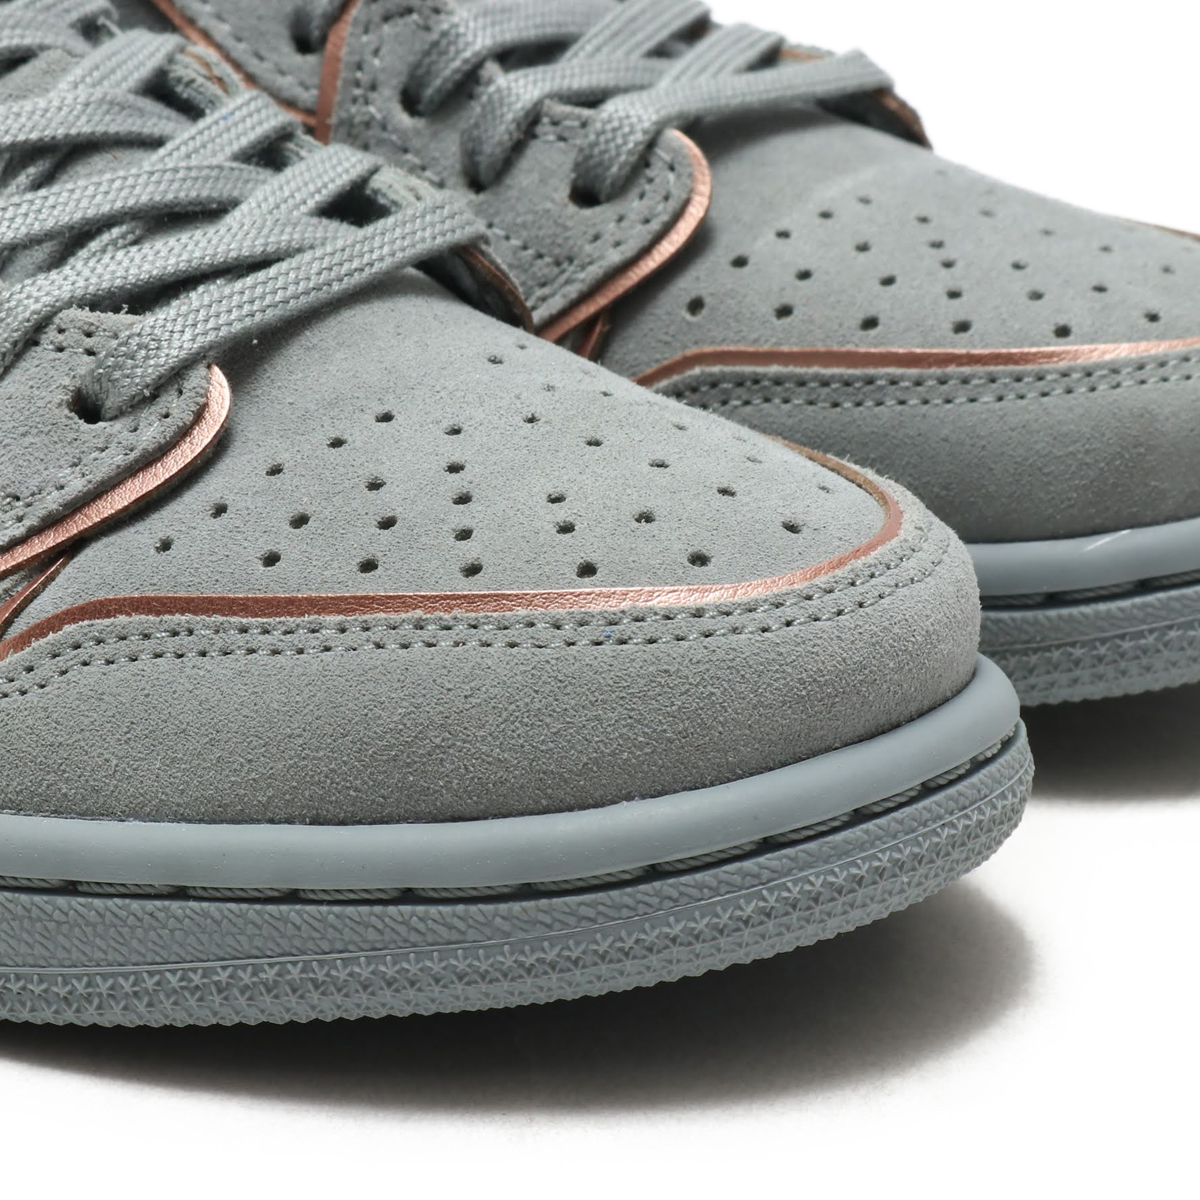 332838099d74 NIKE WMNS AIR JORDAN 1 RETRO LOW NS (Nike women Air Jordan 1 nostalgic low  NS) (MICA GREEN MTLC RED BRONZE) 18SU-S